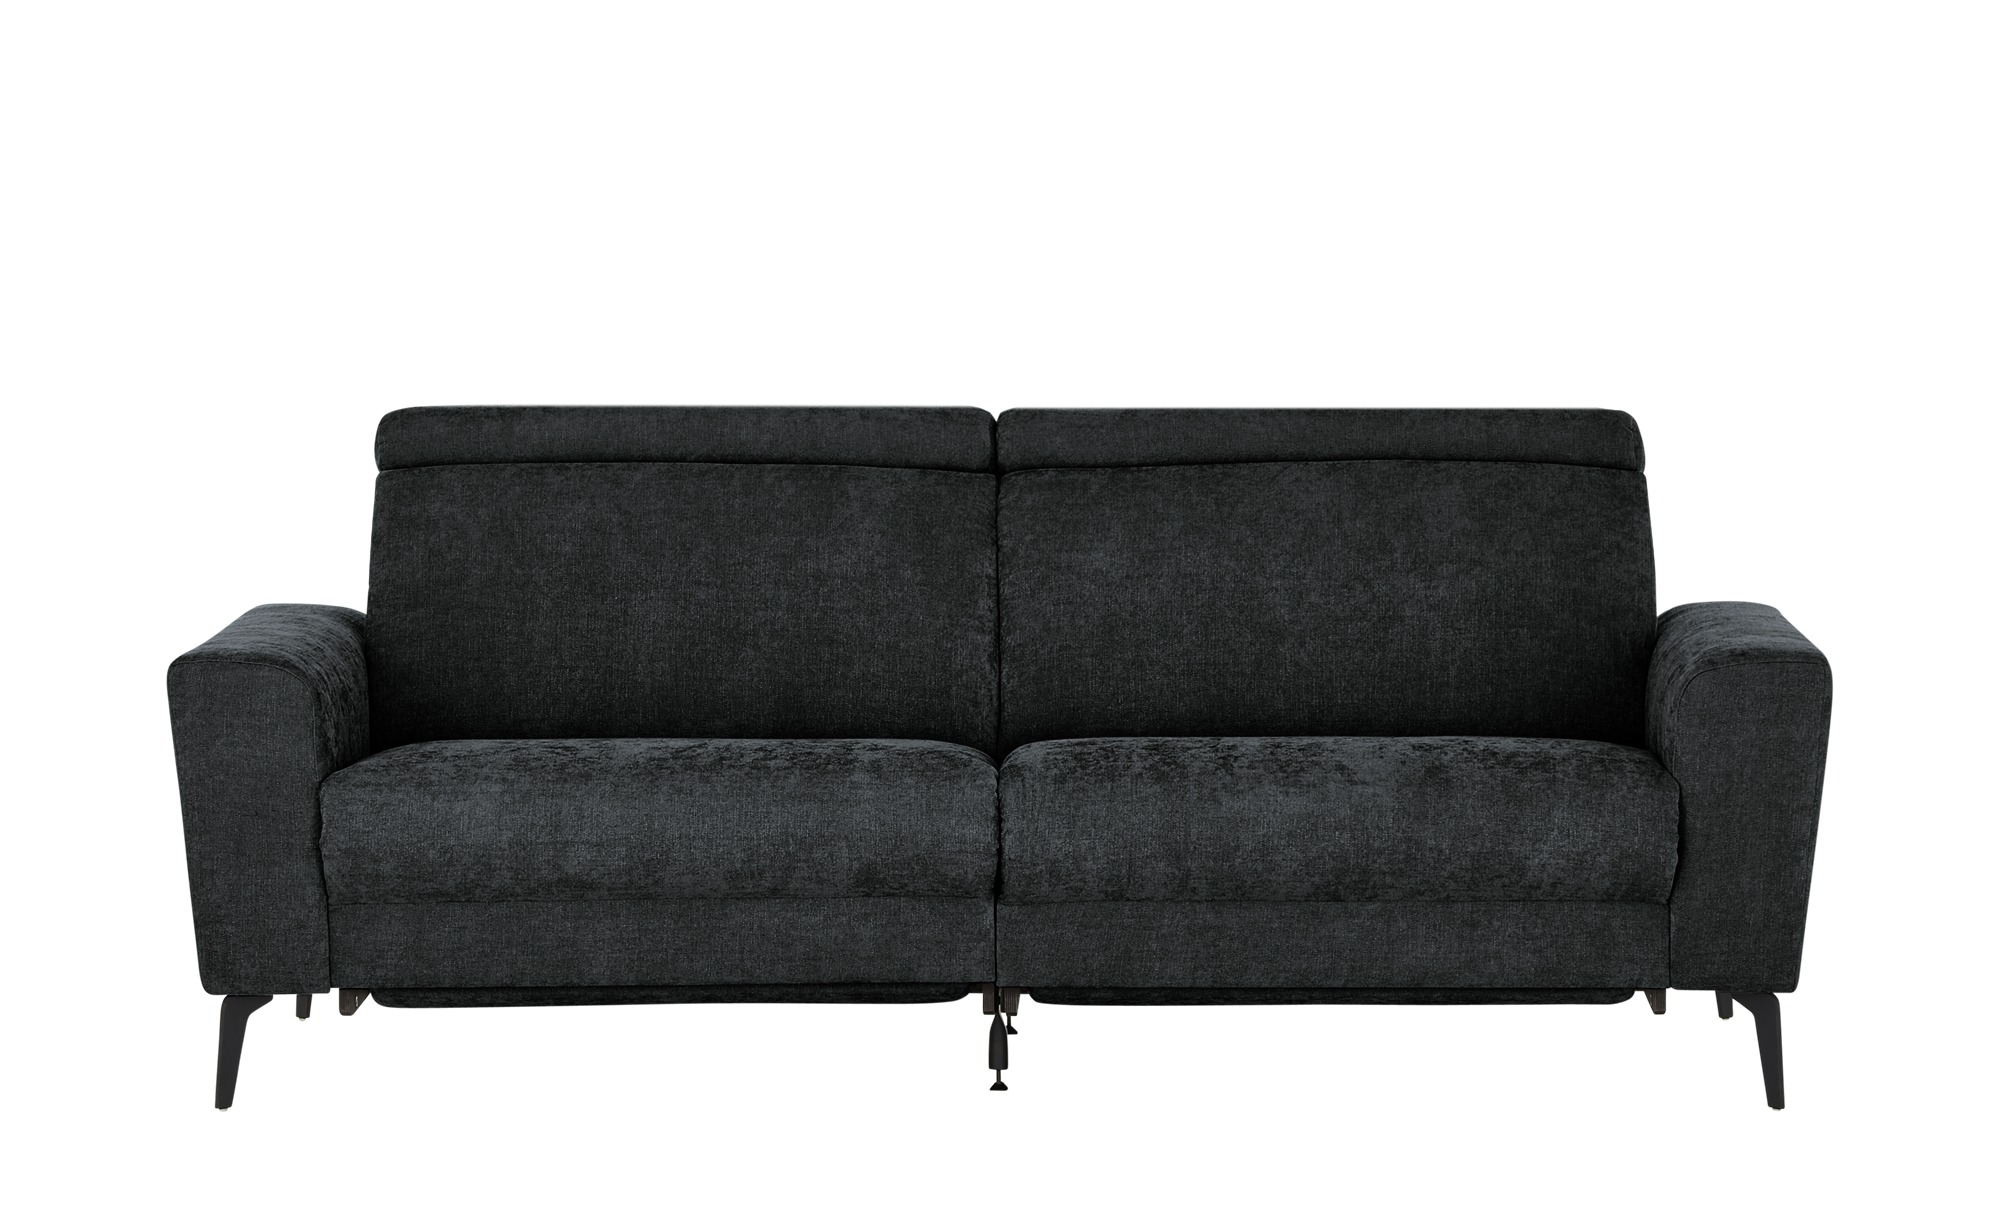 Sofa   Billund ¦ grau ¦ Maße (cm): B: 220 H: 90 T: 90 Polstermöbel > Sofas > 3-Sitzer - Höffner